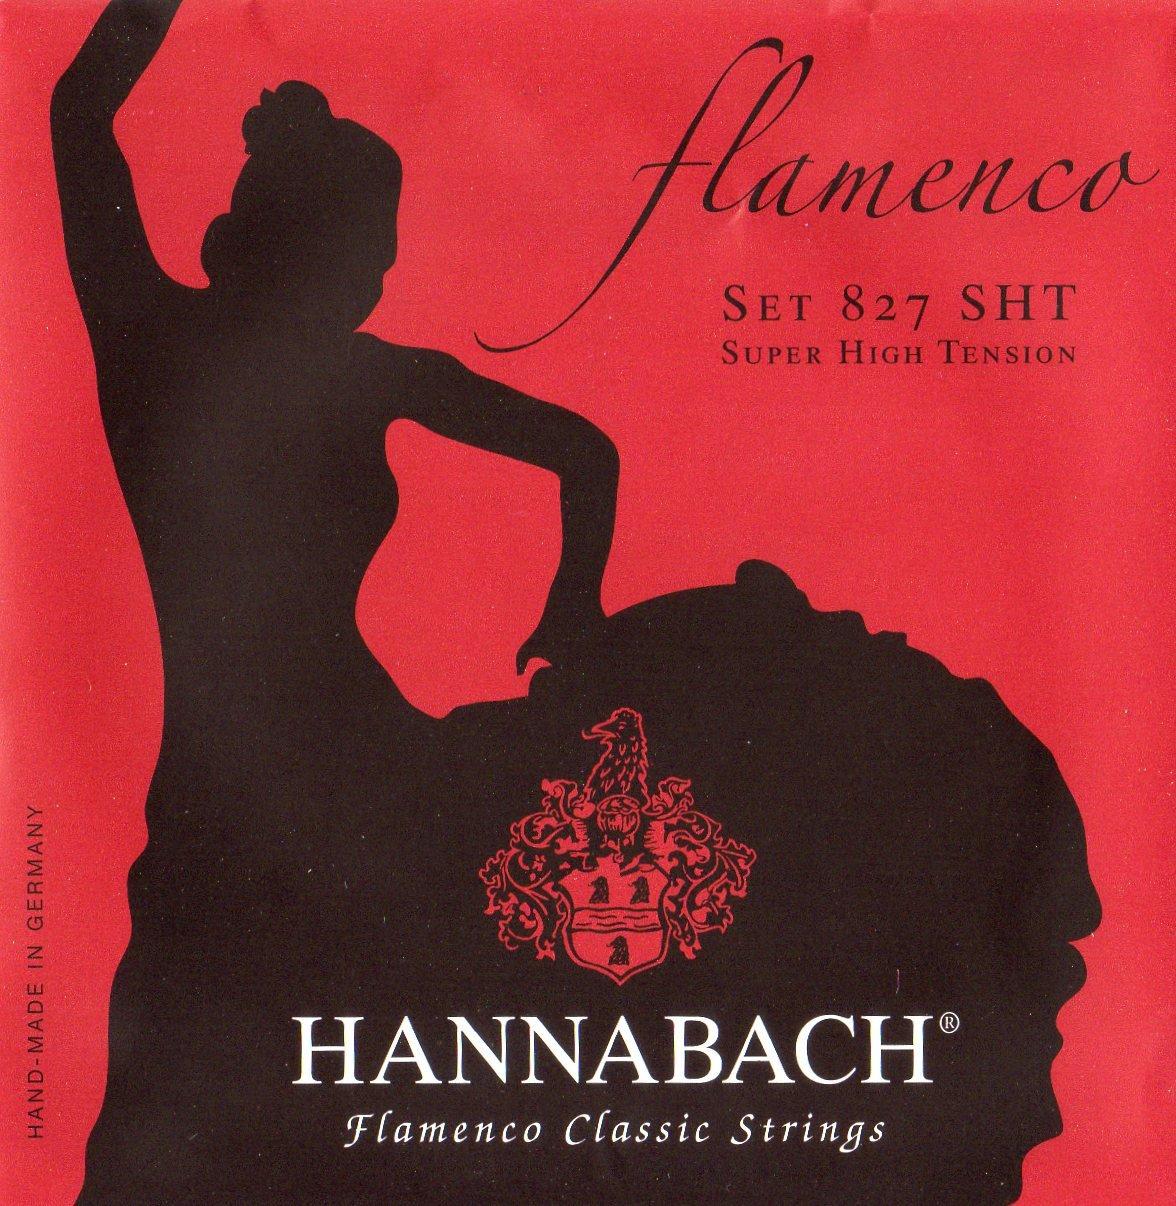 Hannabach Classical Guitar Flamenco Guitar Super High Tension Polished 827-SHT Howard Core Company 652947 HA.827SHT